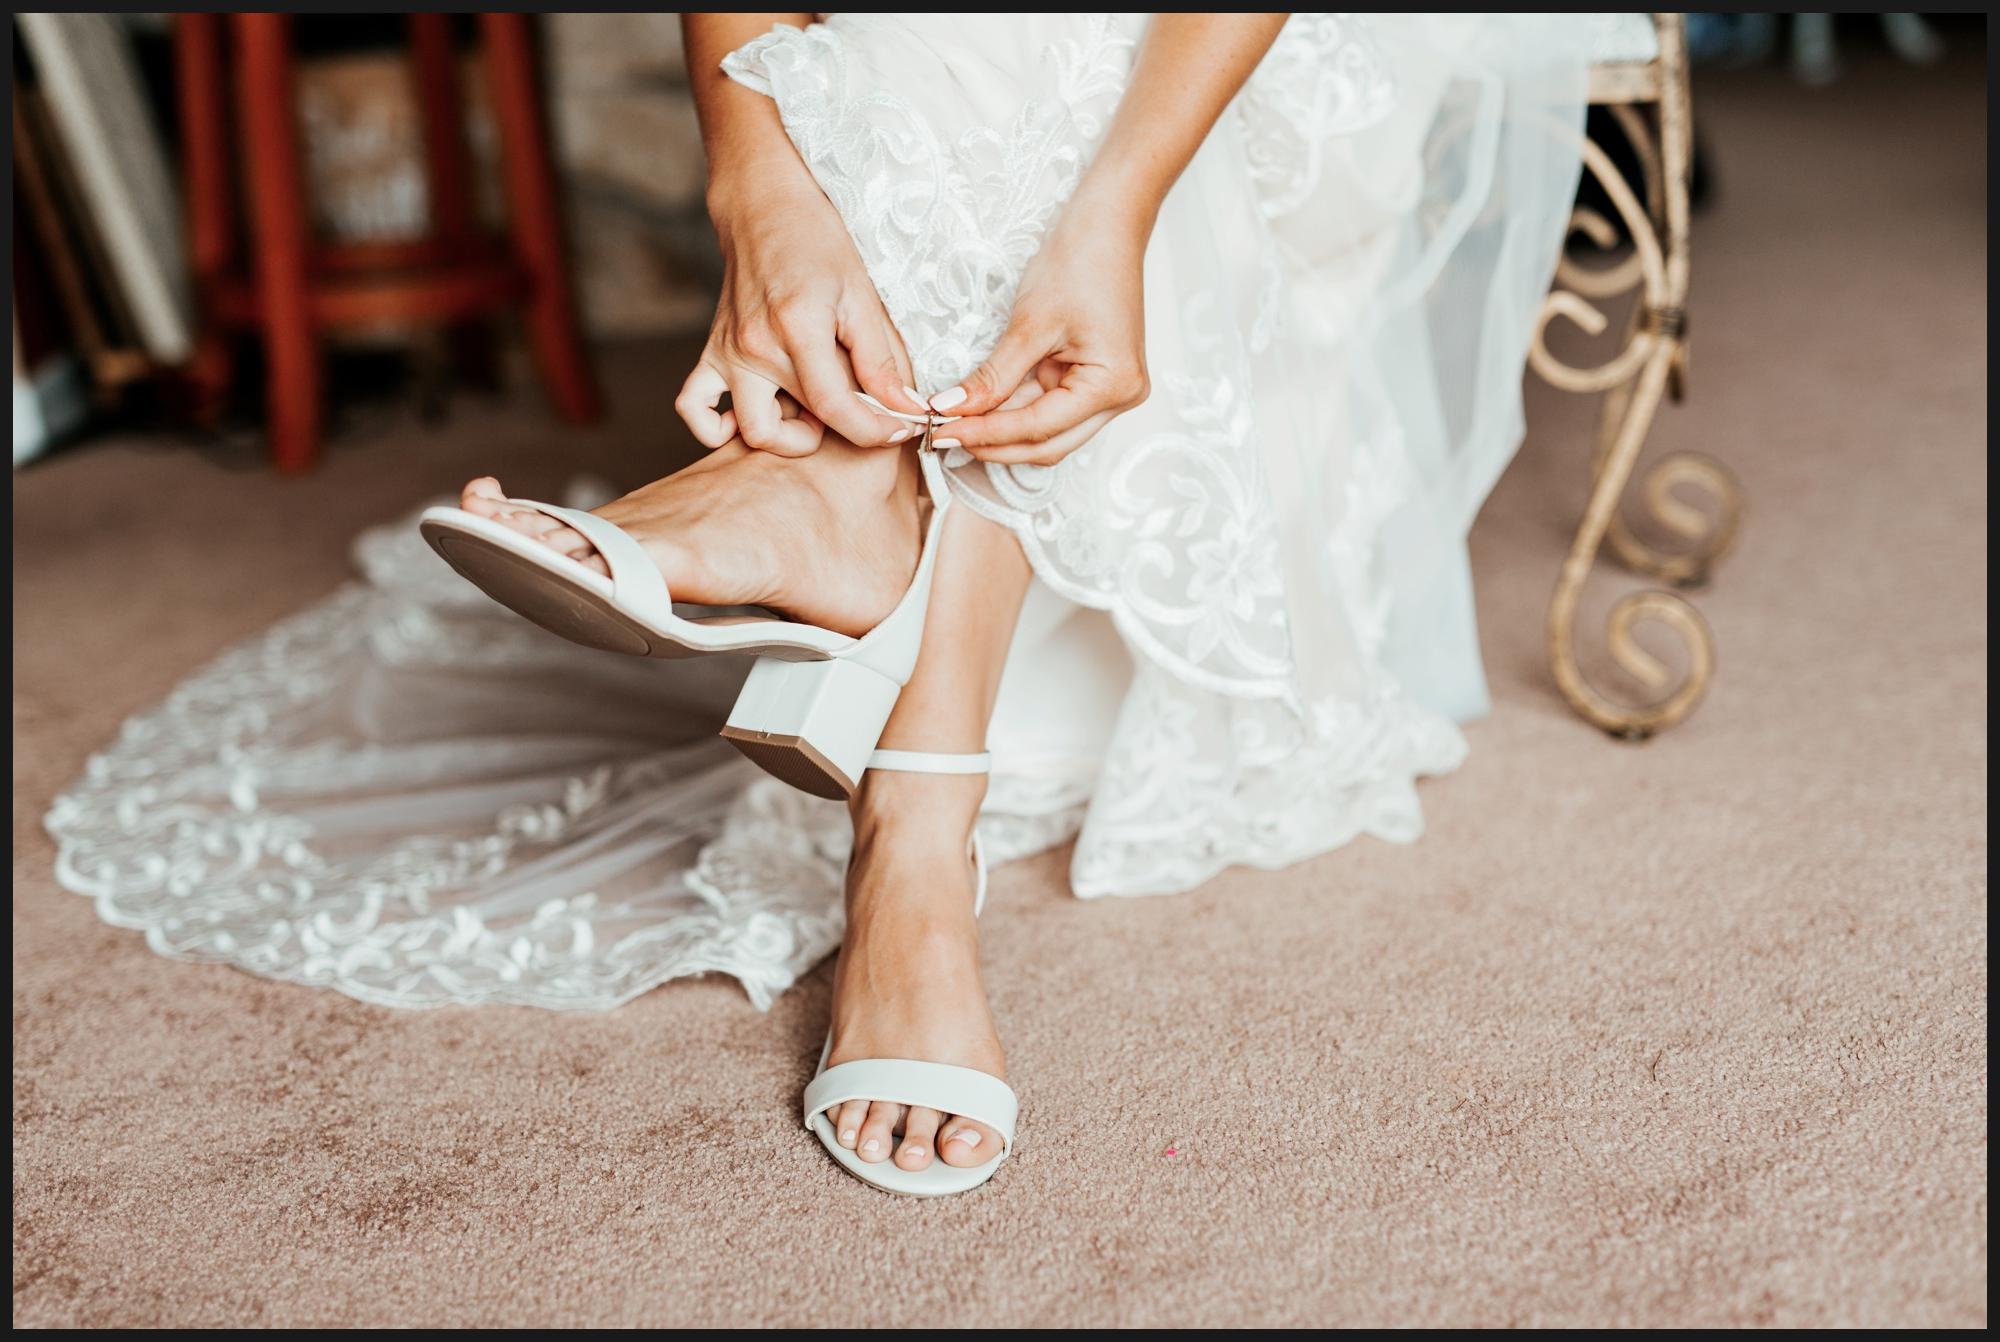 Orlando-Wedding-Photographer-destination-wedding-photographer-florida-wedding-photographer-hawaii-wedding-photographer_0284.jpg